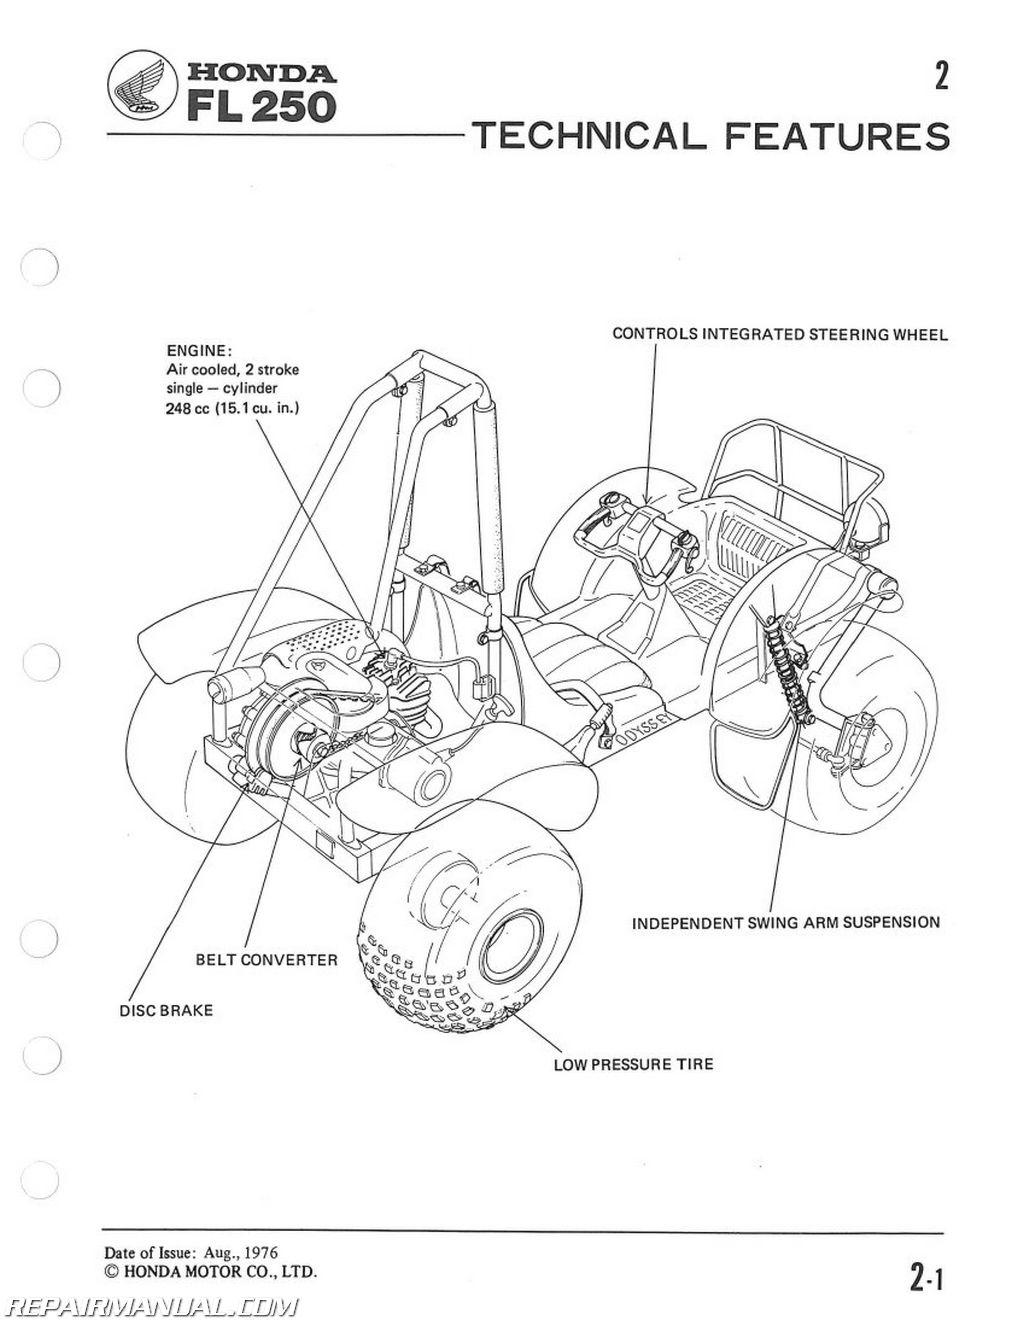 honda odyssey wiring diagram flow refrigeration cycle 1977 1984 fl250 service manual